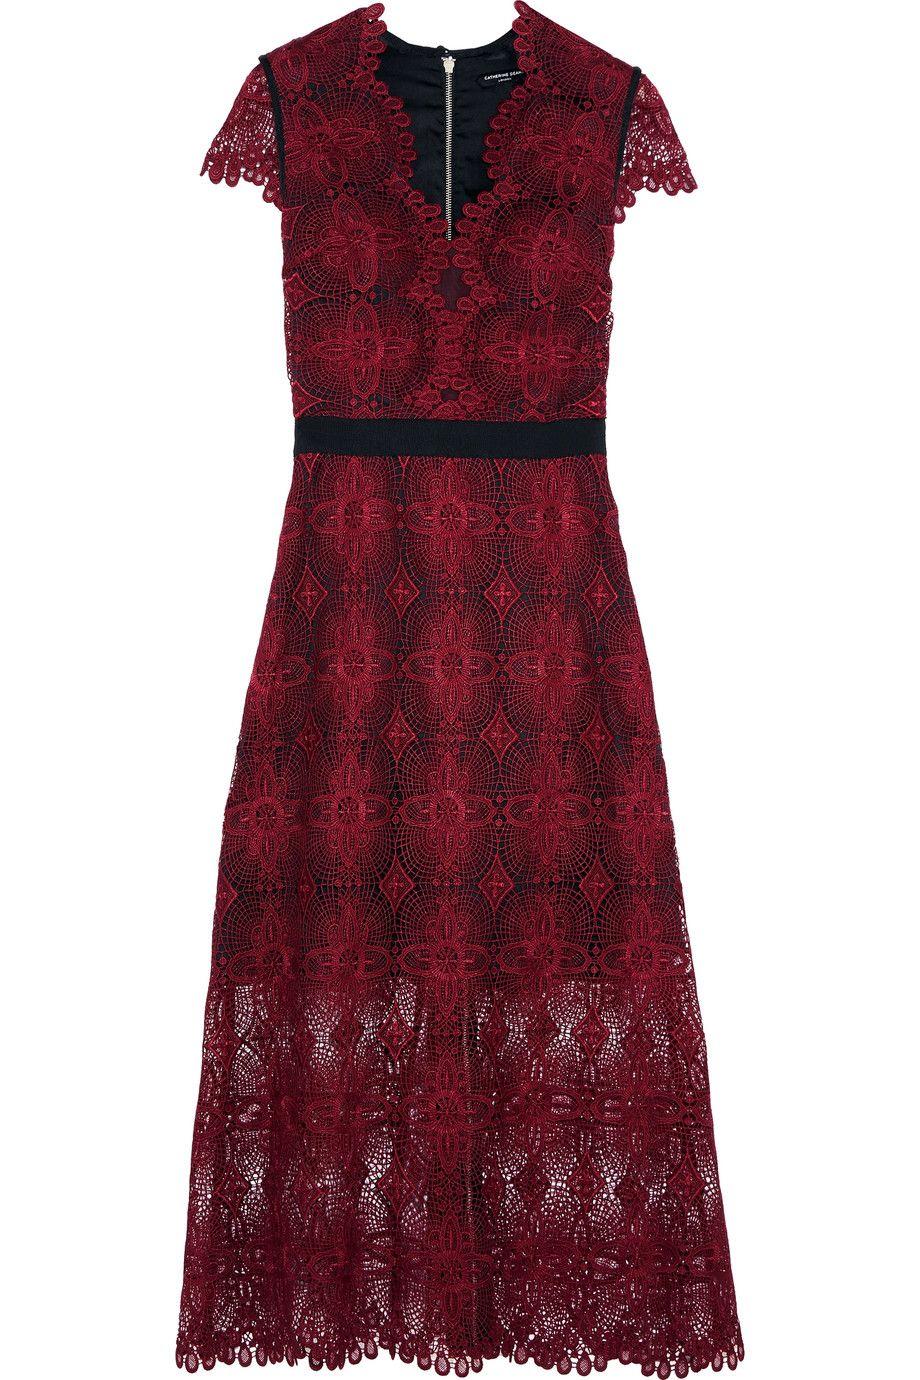 CATHERINE DEANE Garland guipure lace midi dress. #catherinedeane #cloth # dress   Catherine Deane   Pinterest   Catherine Deane, Lace midi dress and  Midi ...